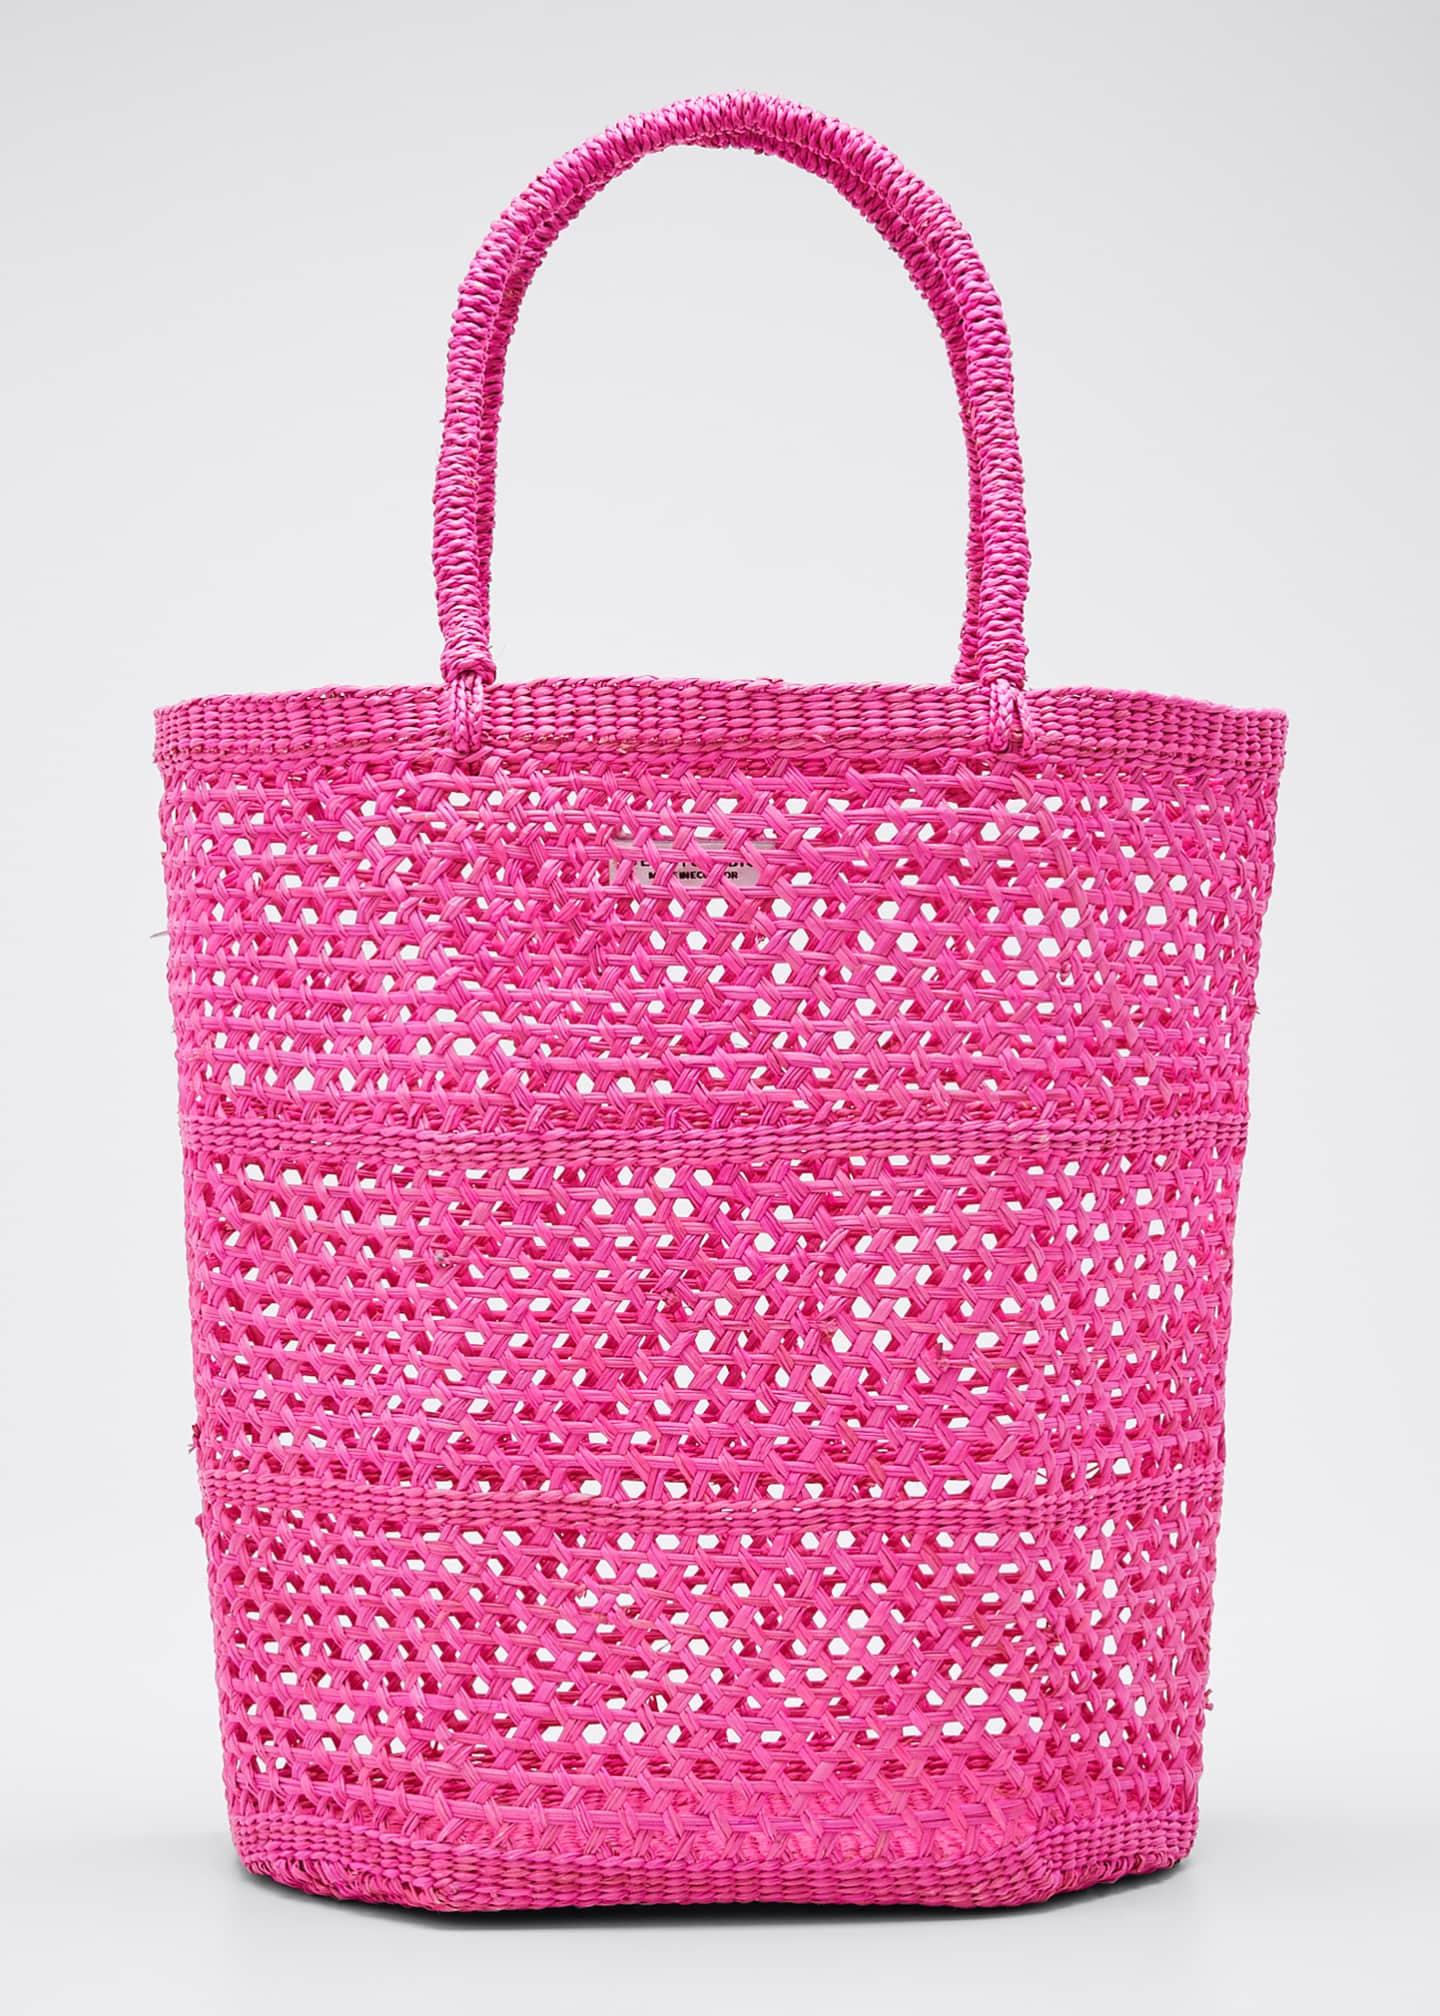 Sensi Studio Woven Straw Basket Tote Bag